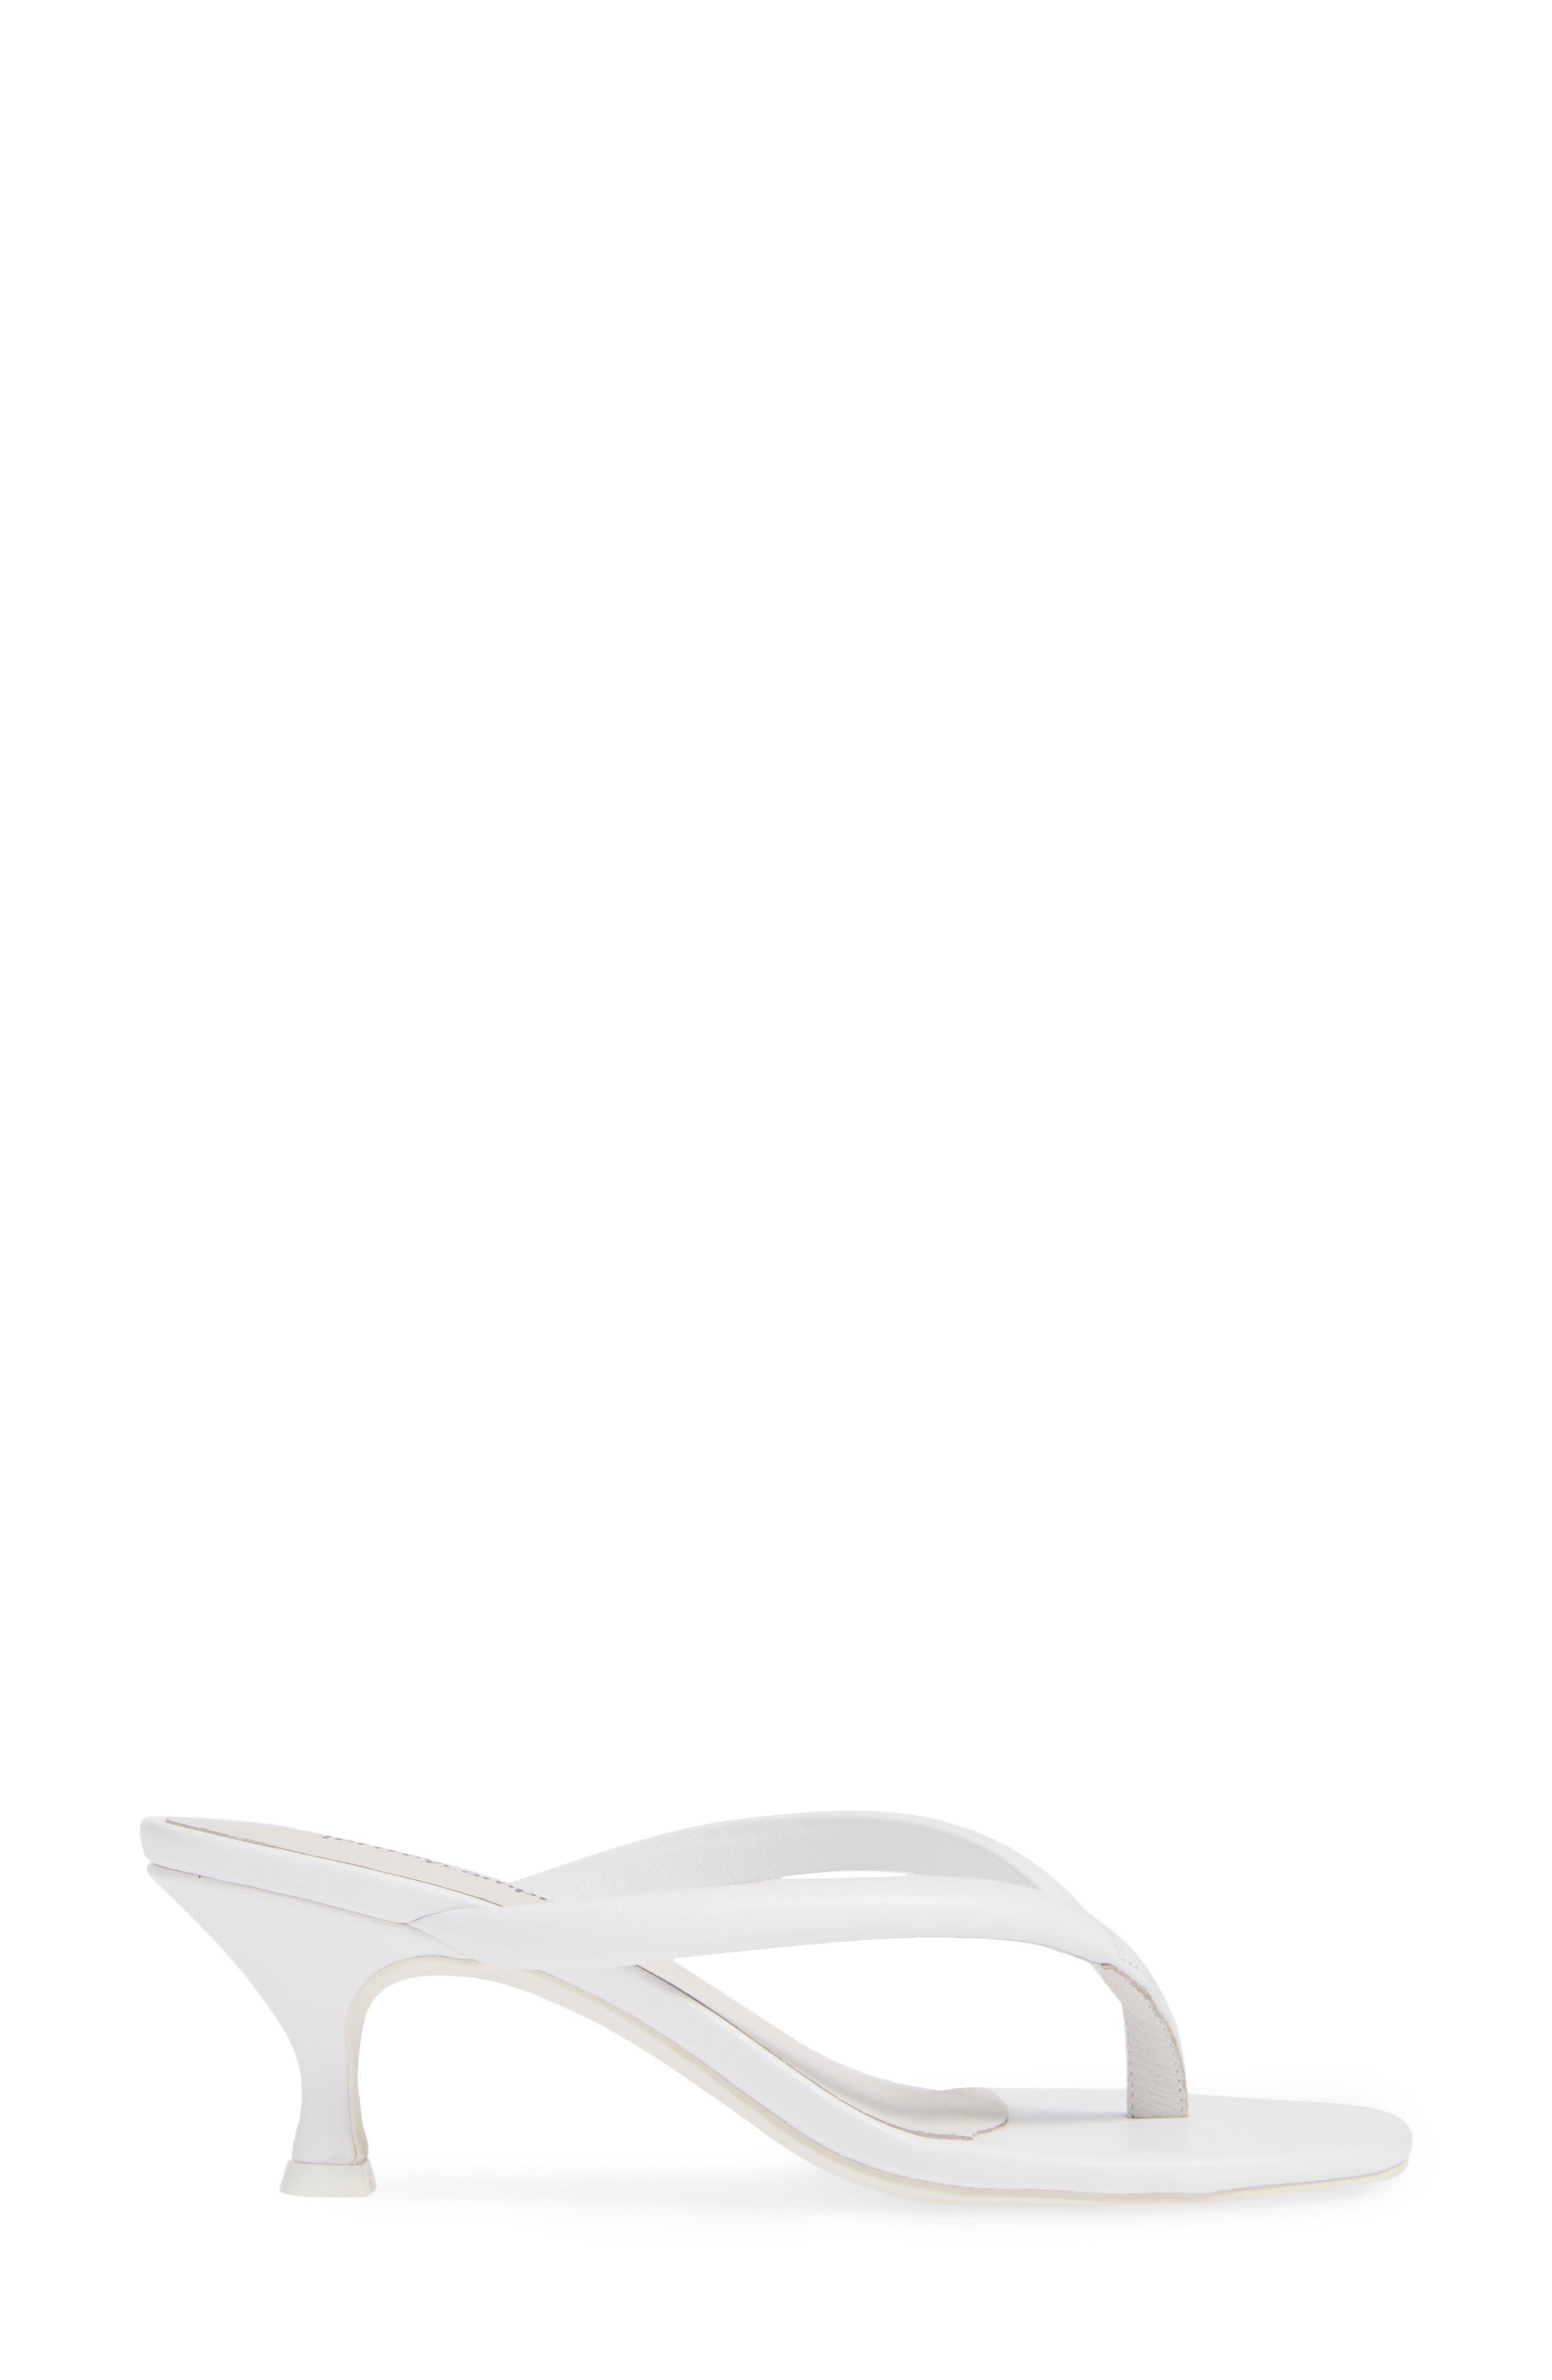 Brink Sandal,                             Alternate thumbnail 3, color,                             WHITE